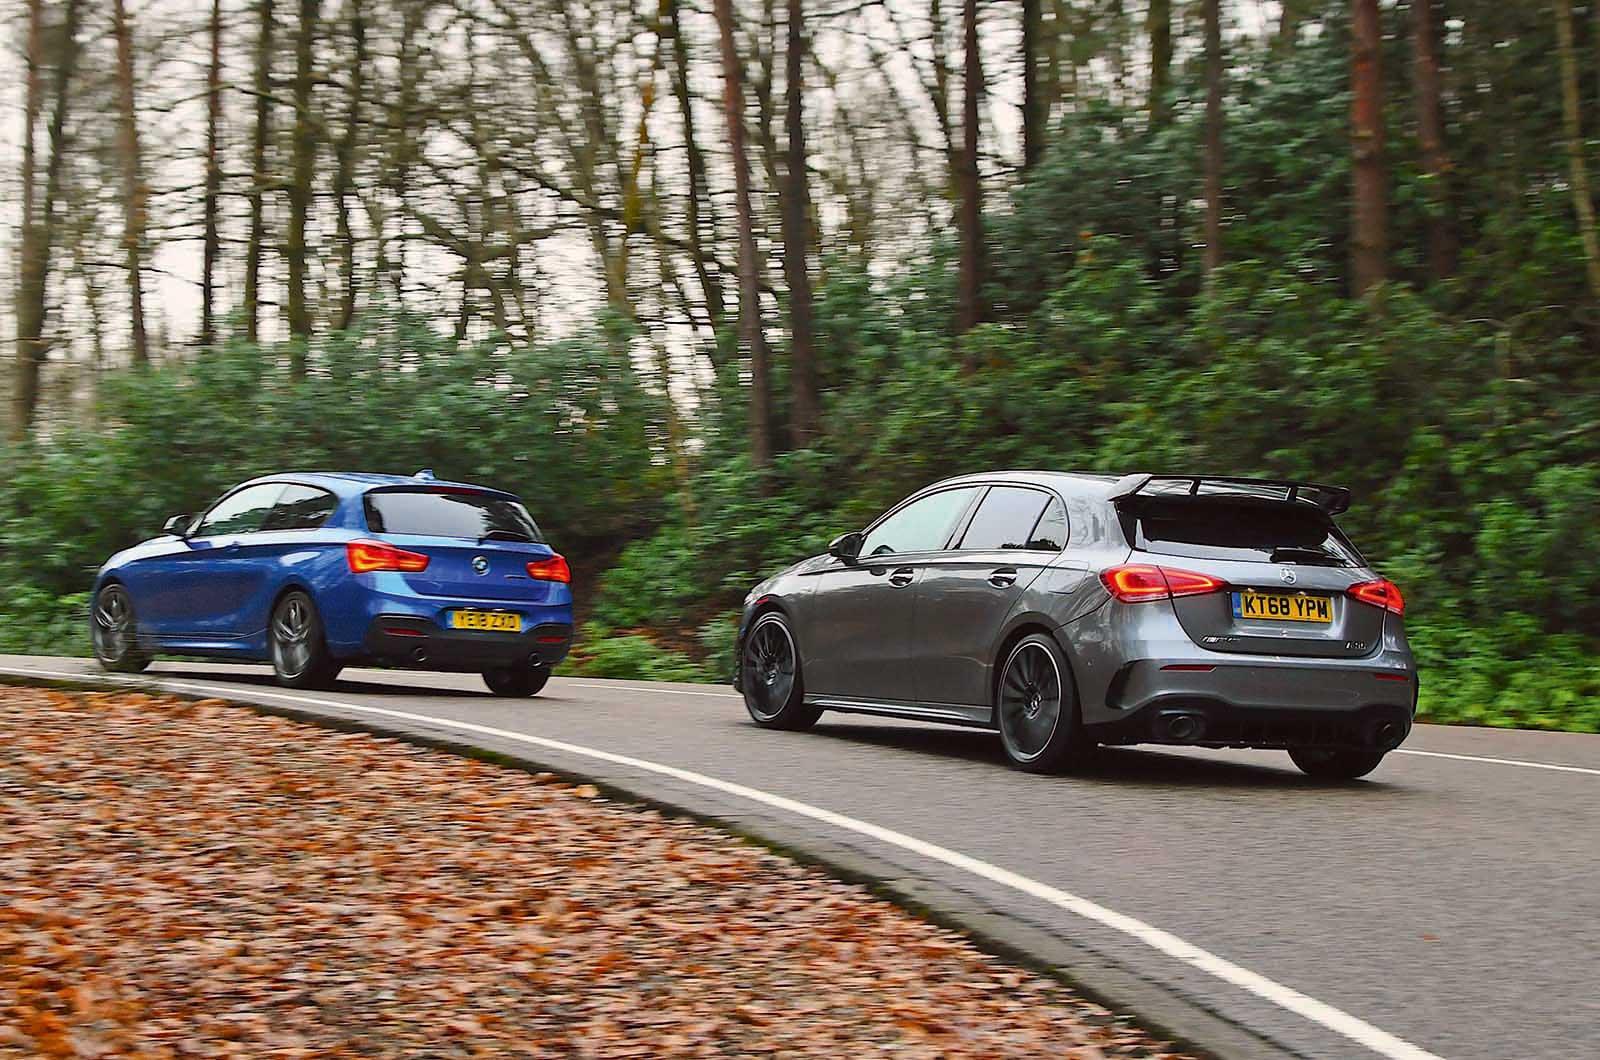 BMW M140i driving